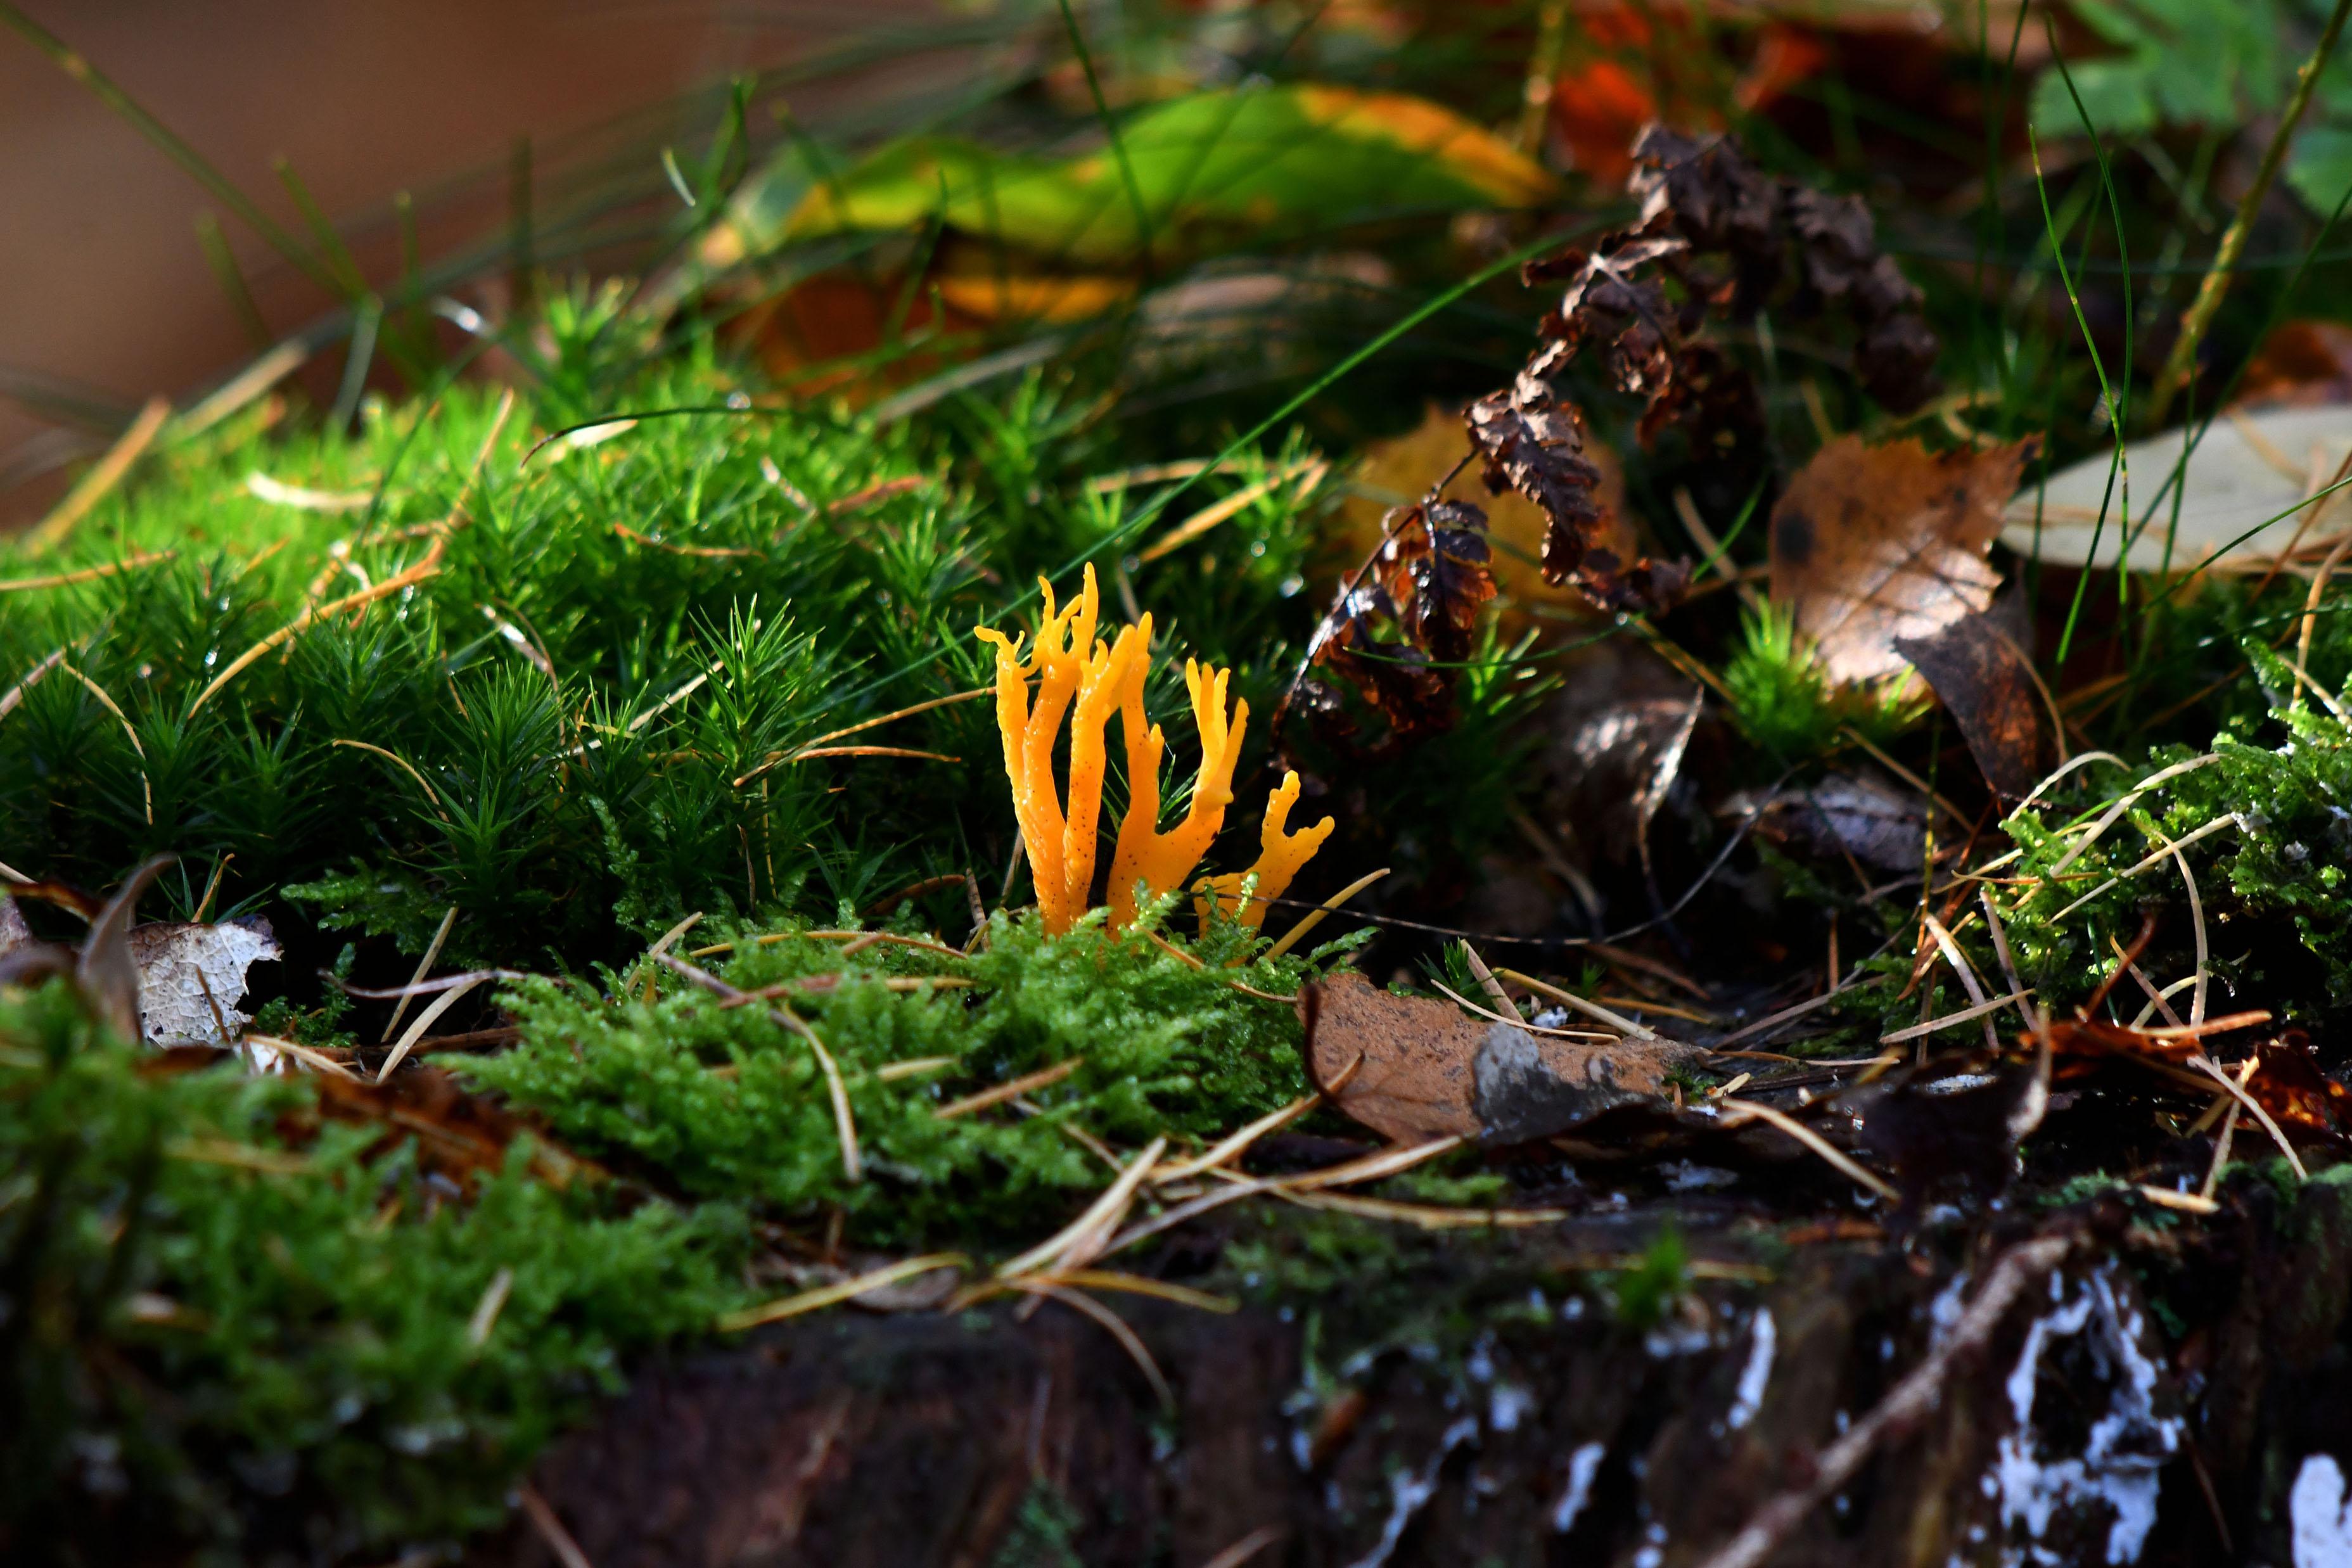 Een prachtig oranje gekleurd kleverig koraalzwammetje tussen het groene mos - Foto: ©Louis Fraanje